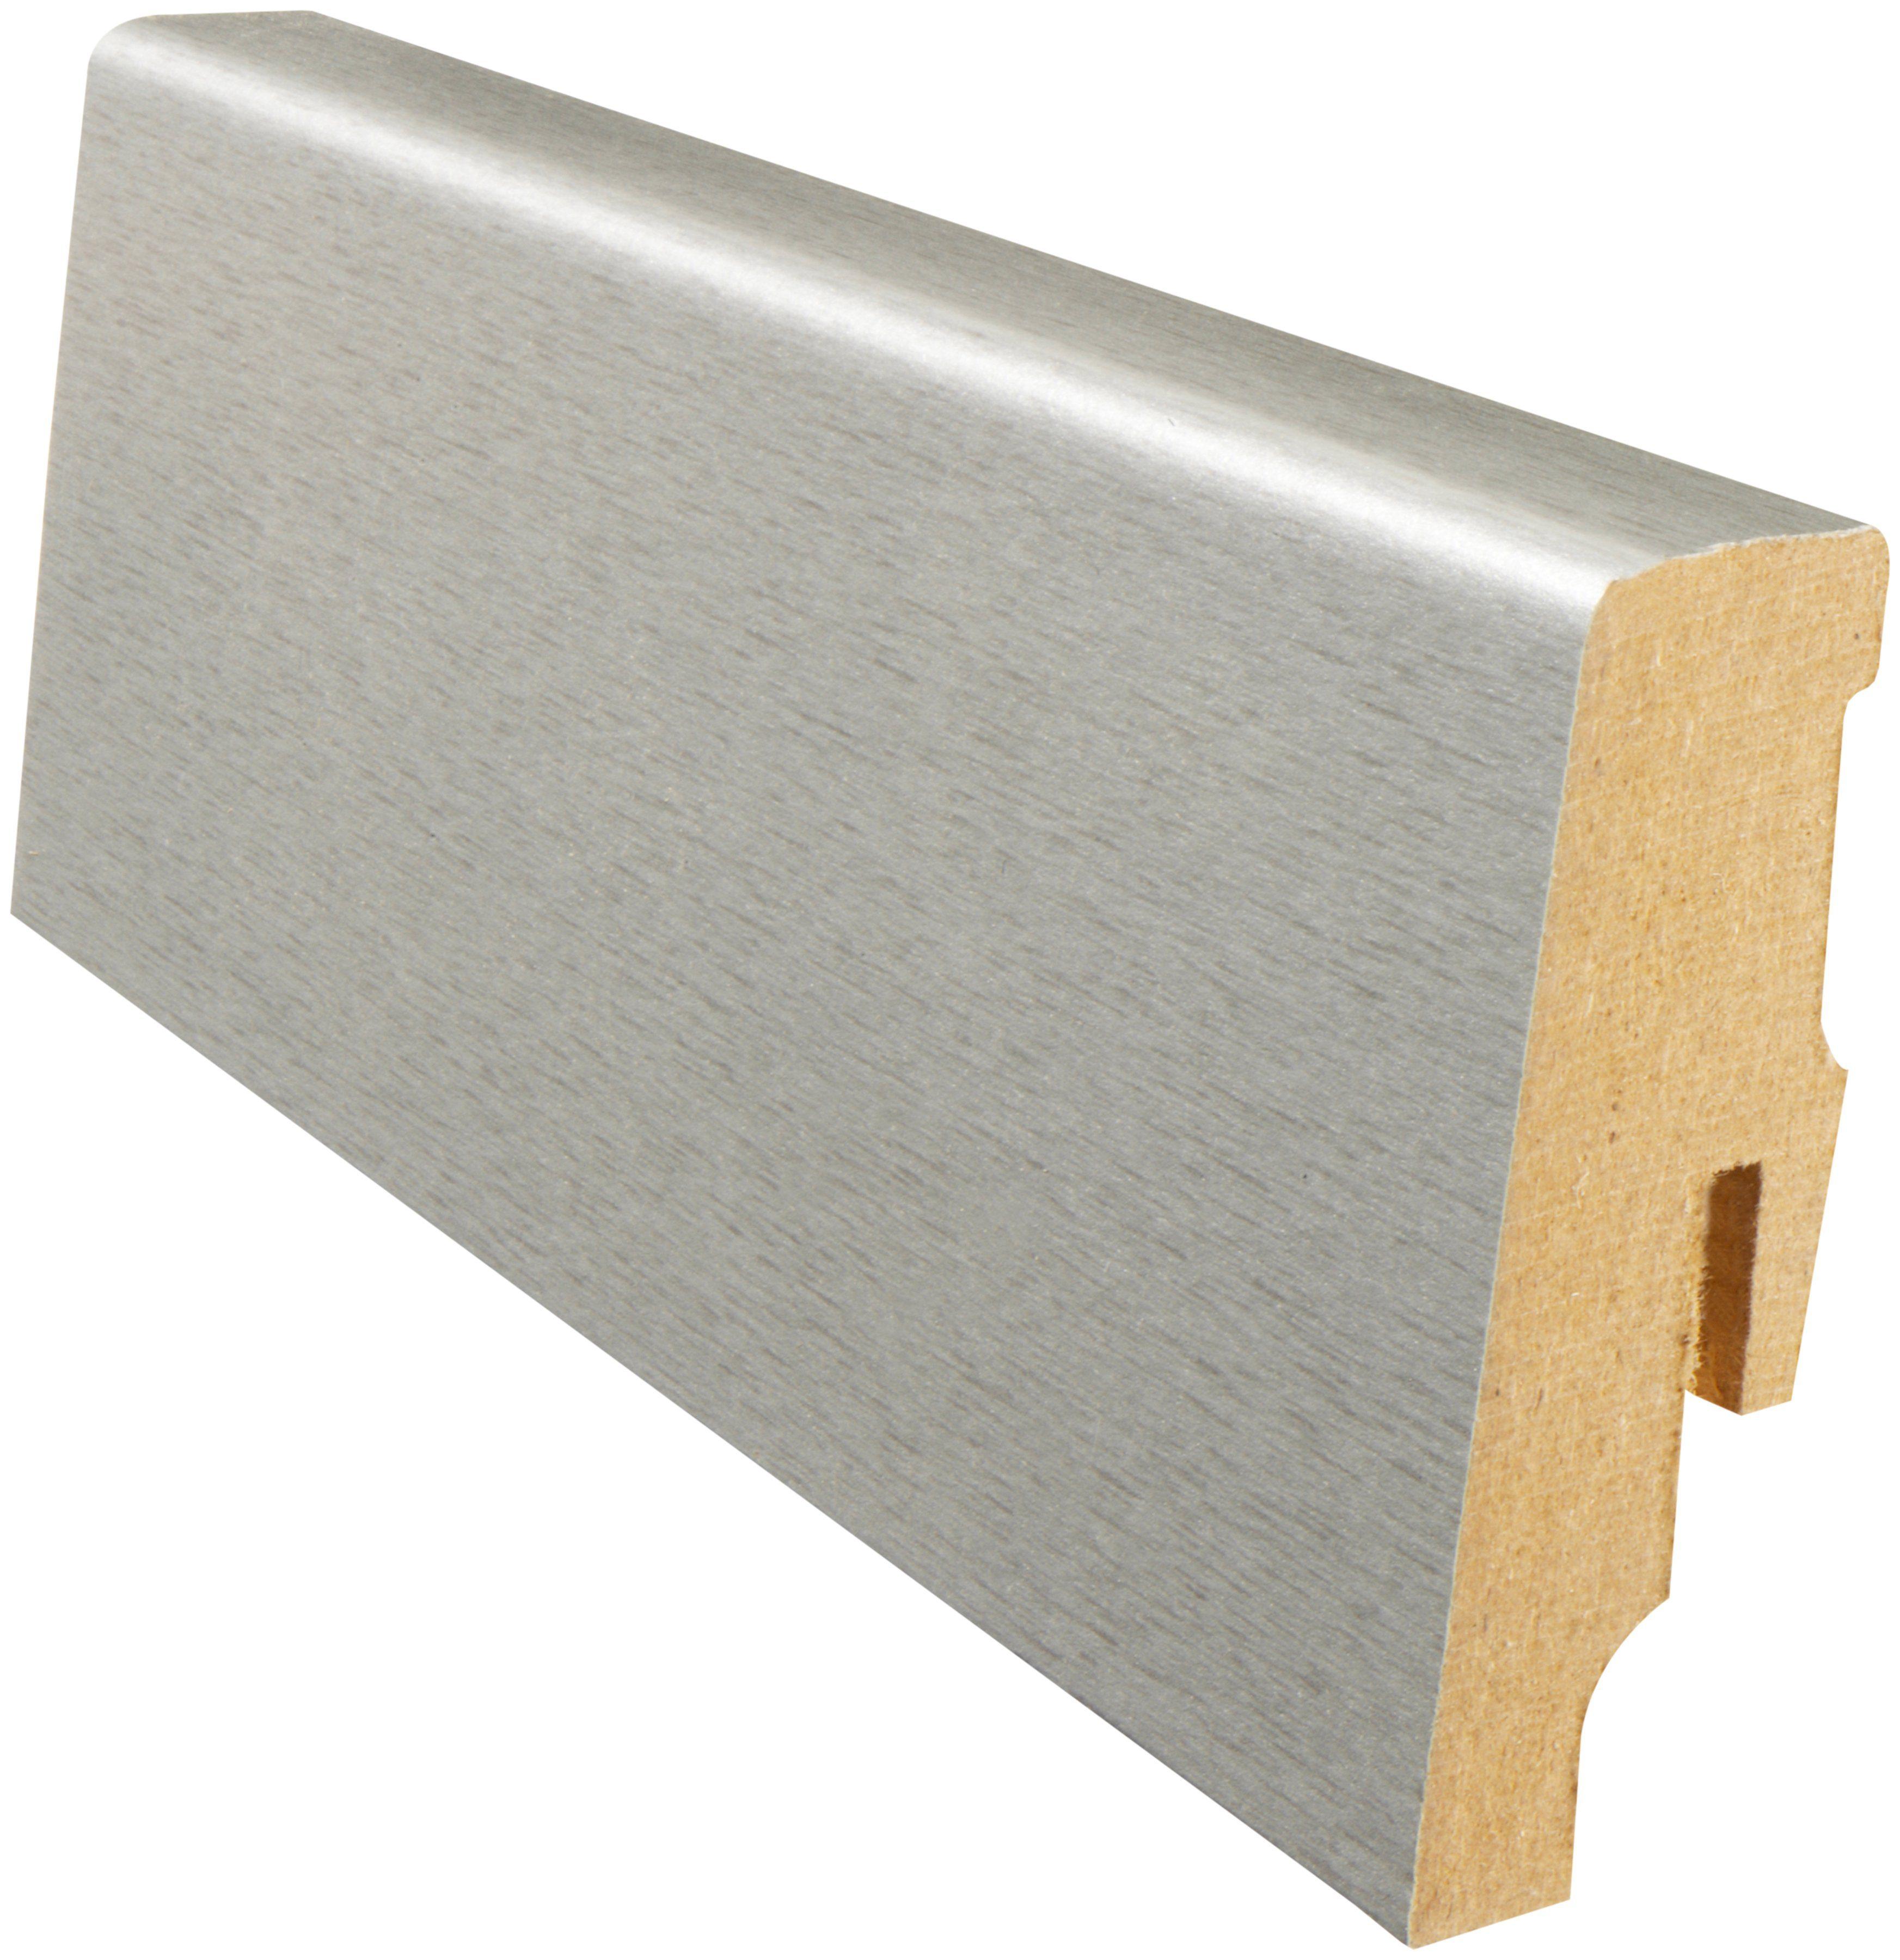 MODERNA Sockelleiste »Designfußleiste DFL 60 - Titan gebürstet«, 1 Stk., Höhe: 6 cm